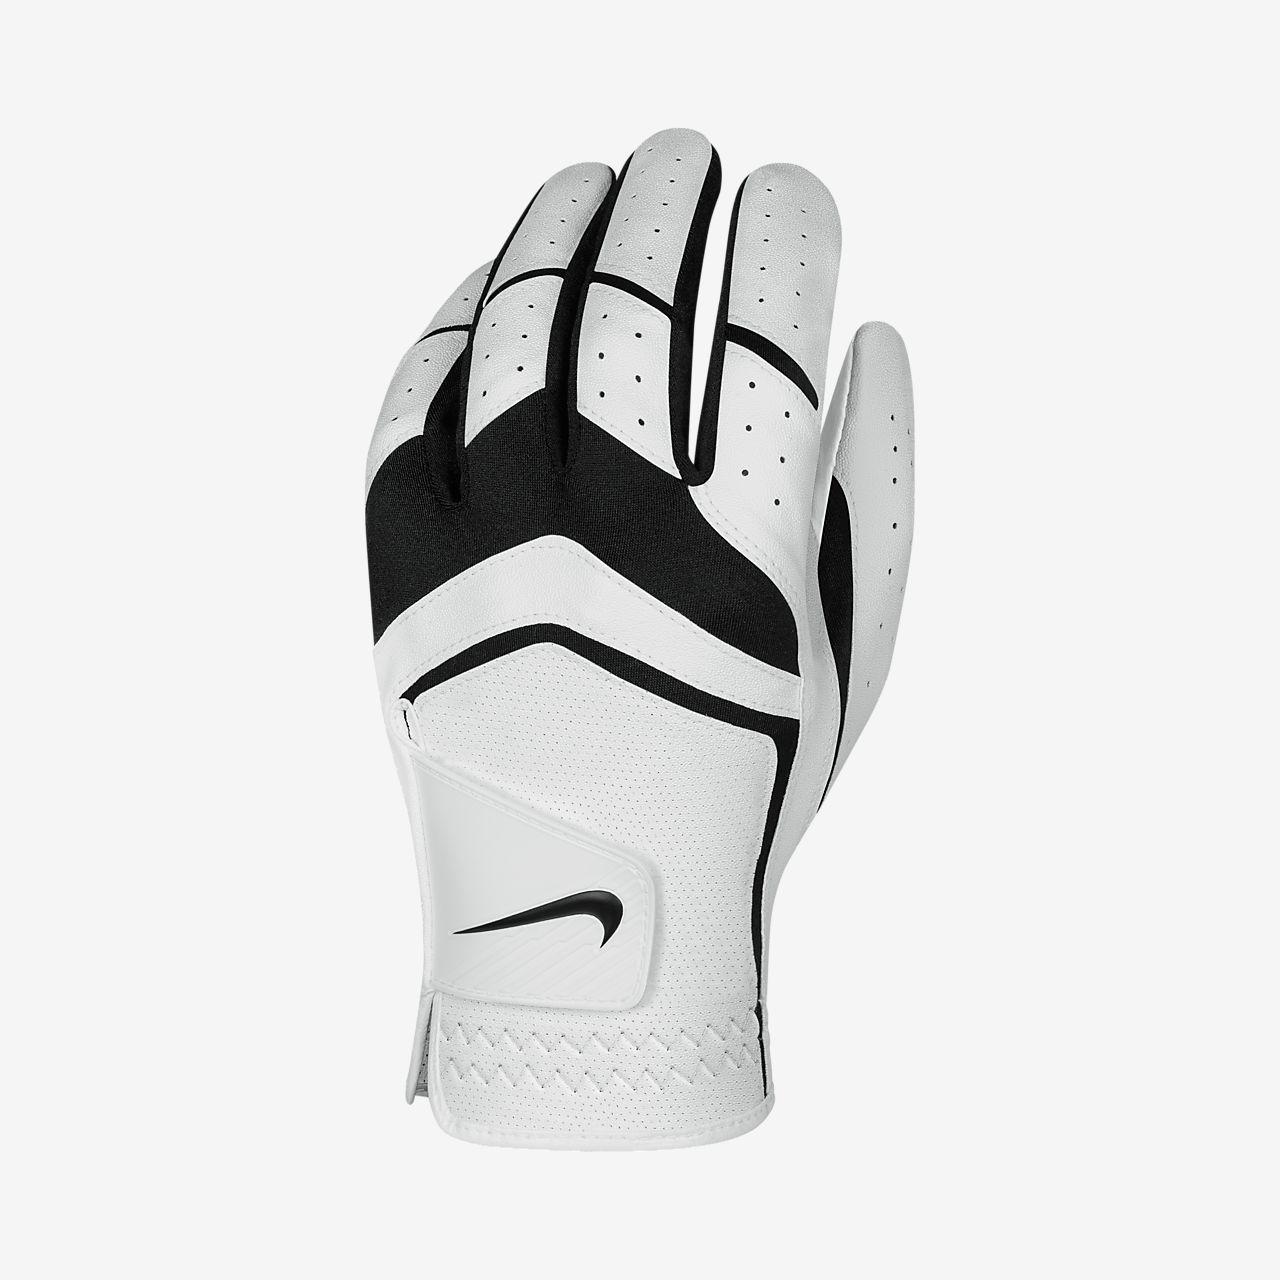 19d46130ef1 Nike Dura Feel VIII (Left Cadet) Golf Glove. Nike.com